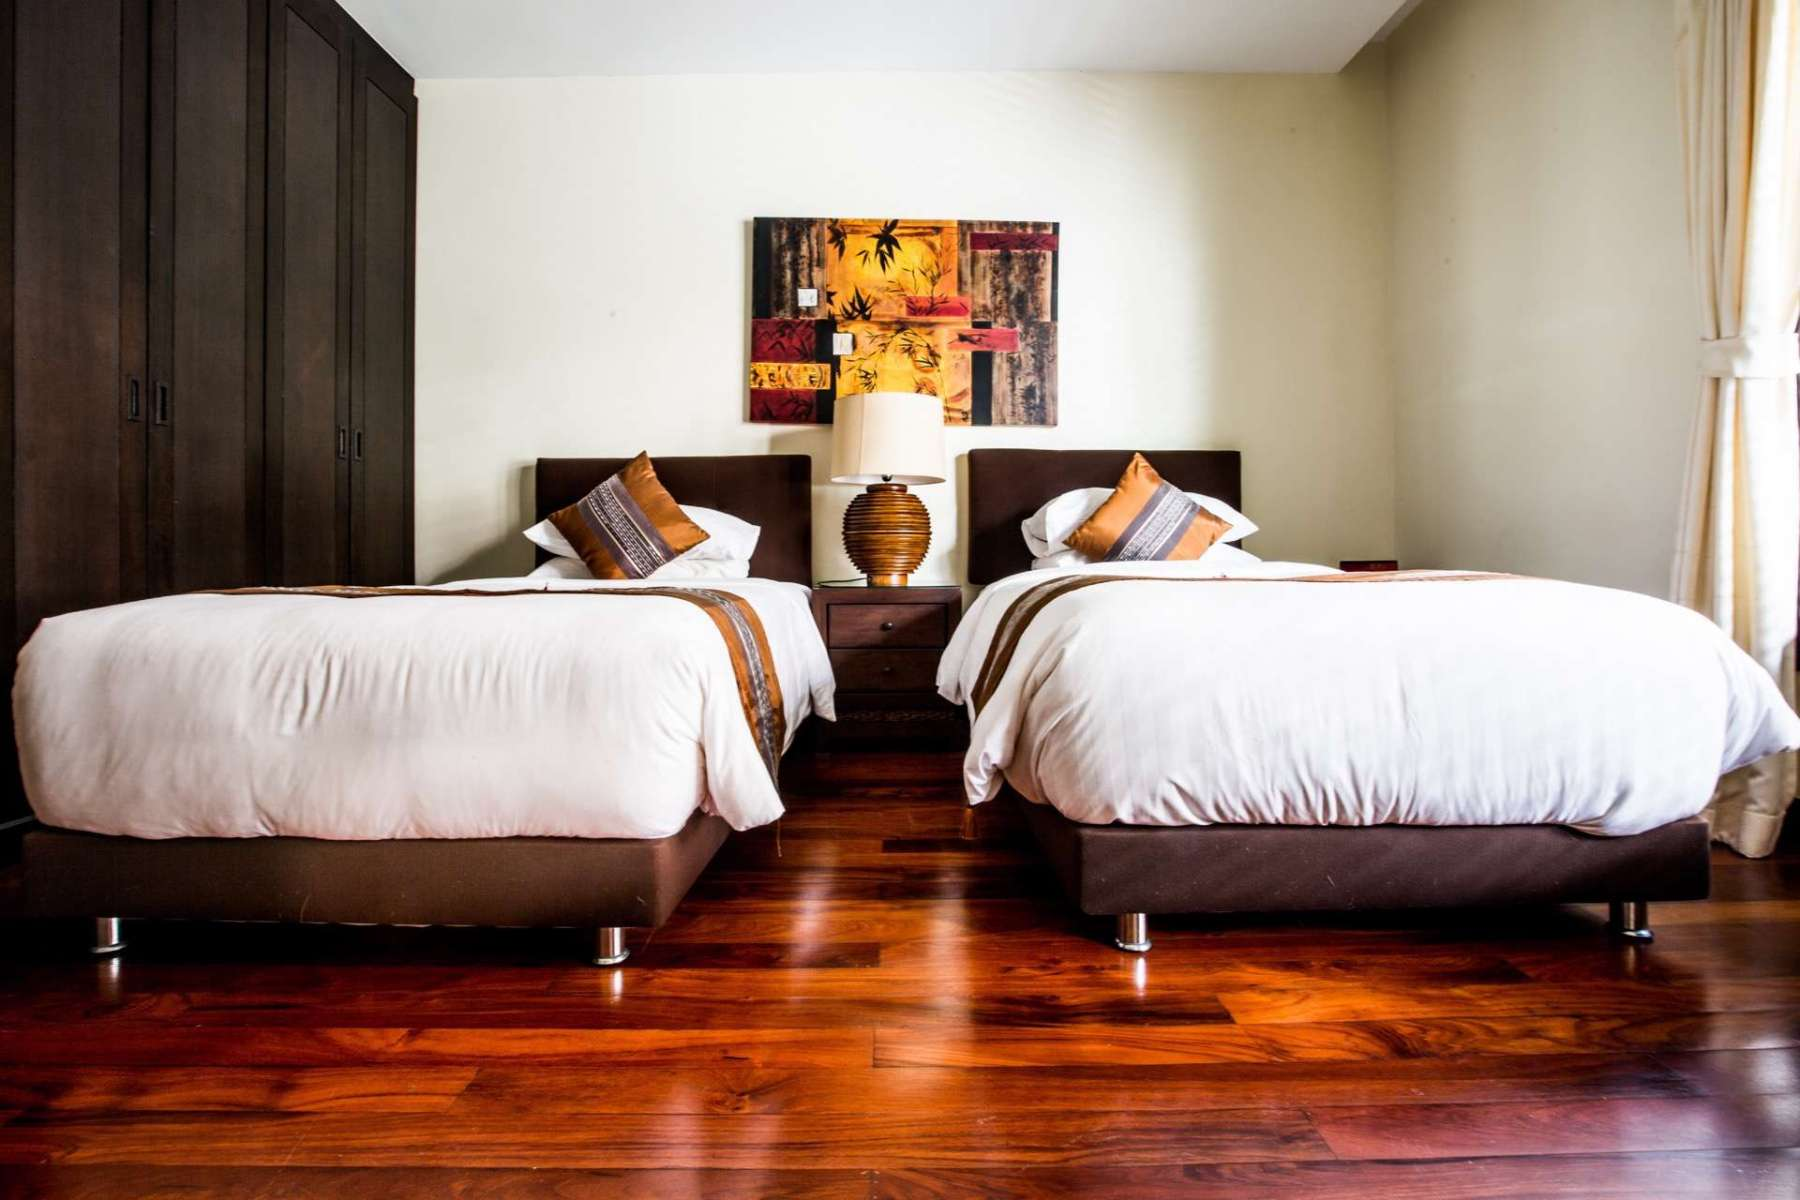 Large-Luxury-Villa-Home-For-Sale-Phuket-Beachfront-Bang-Tao-Thailand-38